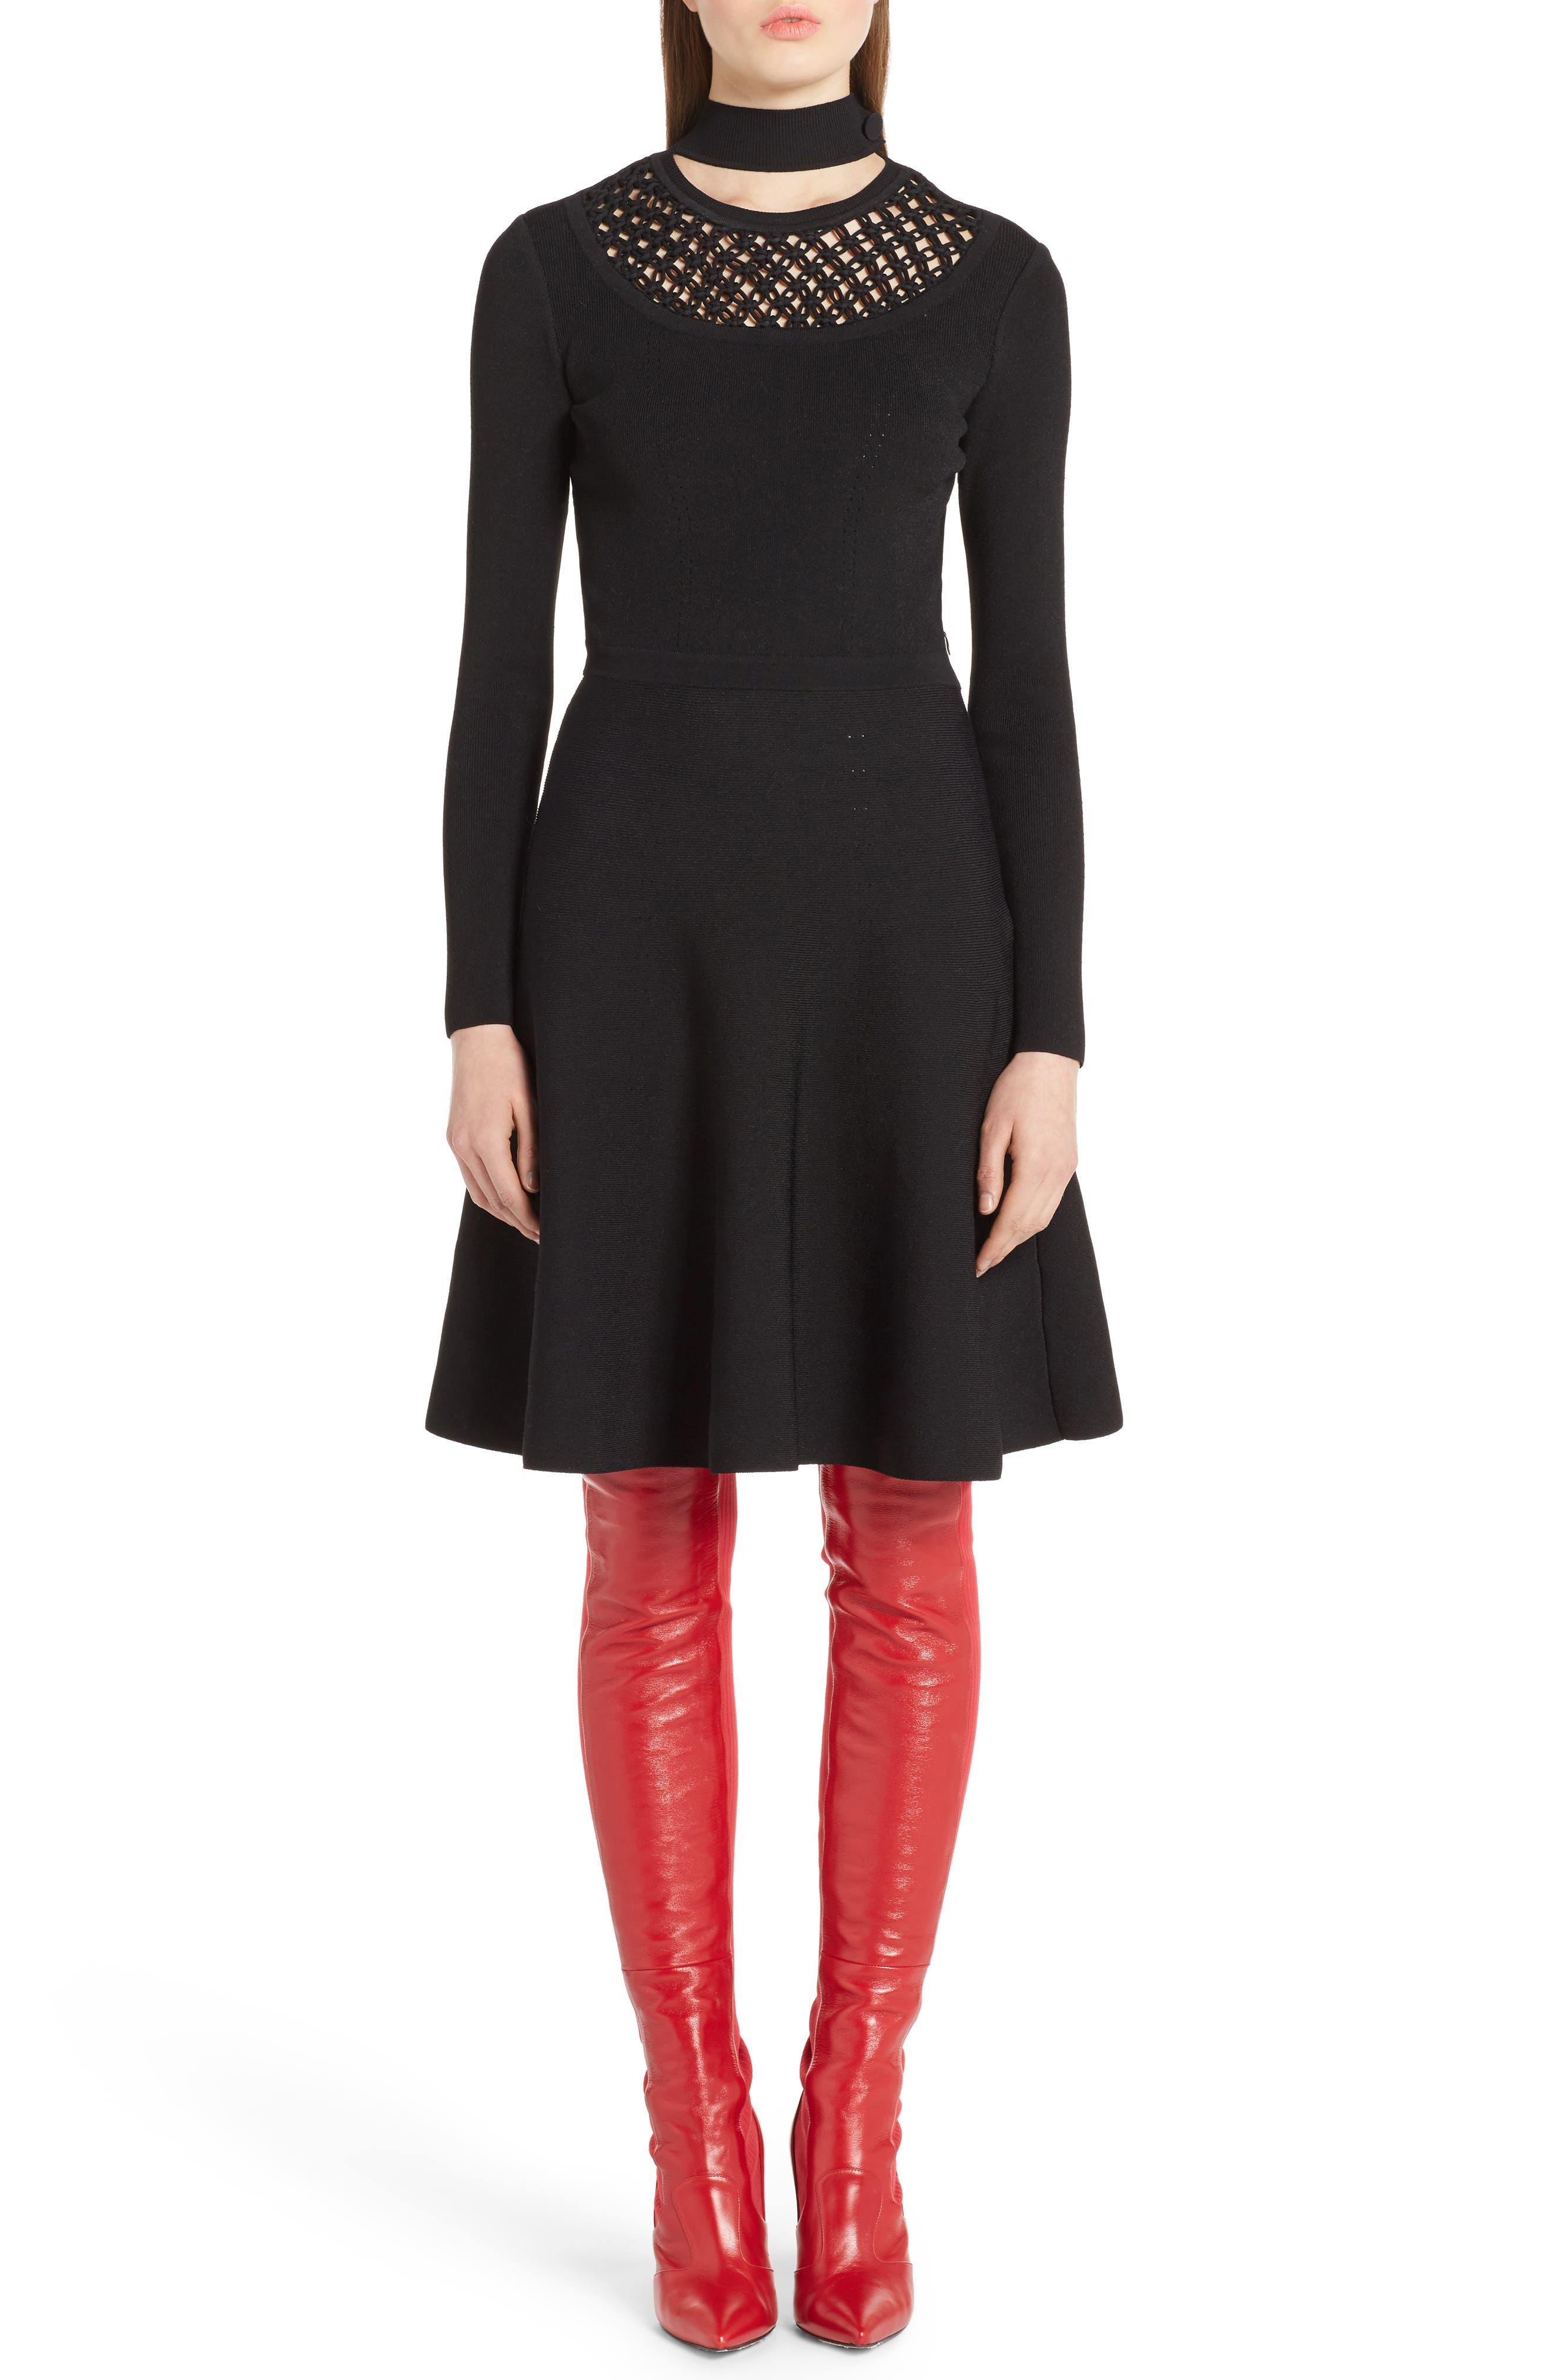 Main Image - Fendi Macramé Inset Knit Dress